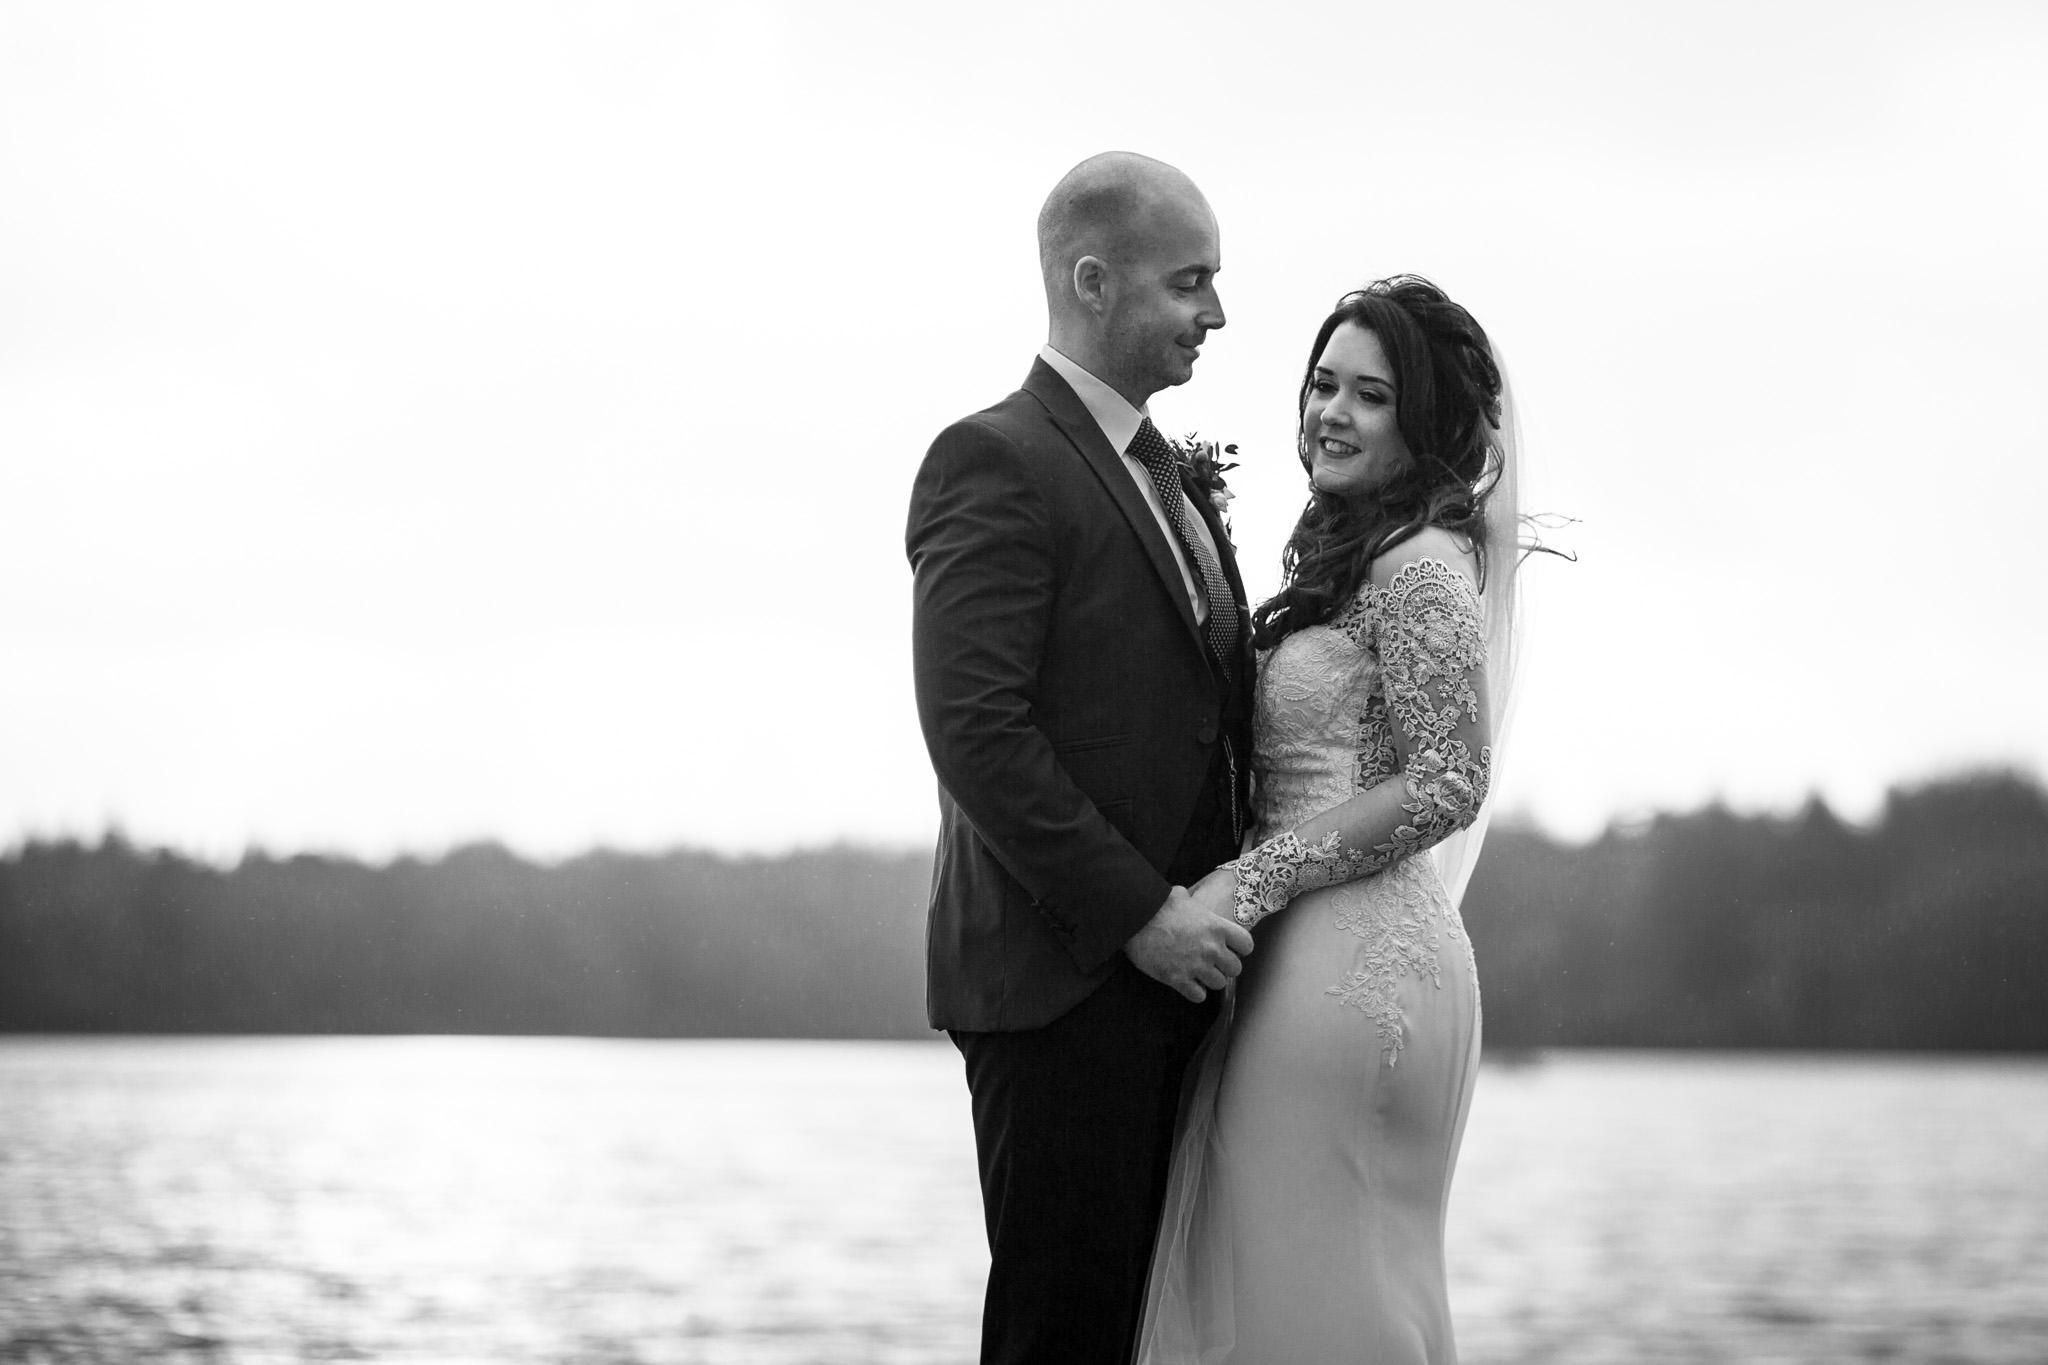 Mark_Barnes_Northern_Ireland_wedding_photographer_Harveys_Point_Donegall_Wedding_photography-Adam&Gemma-36.jpg